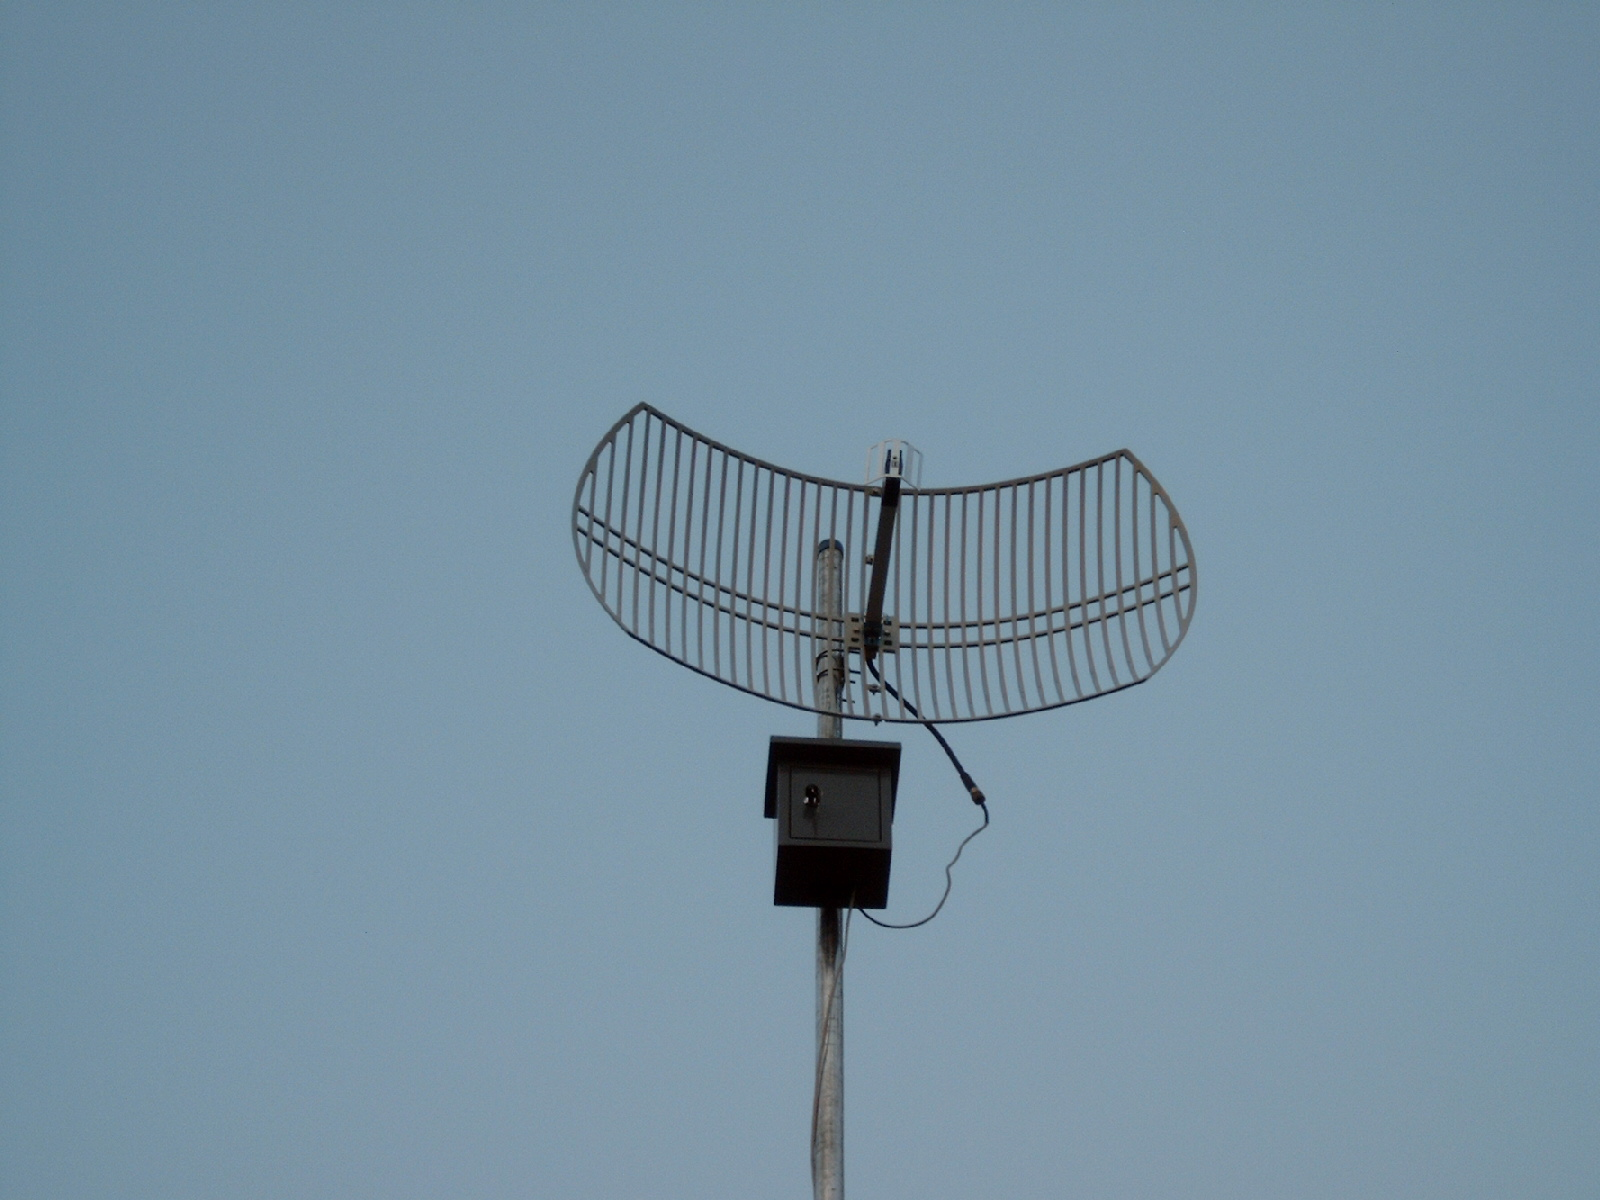 Antena siap